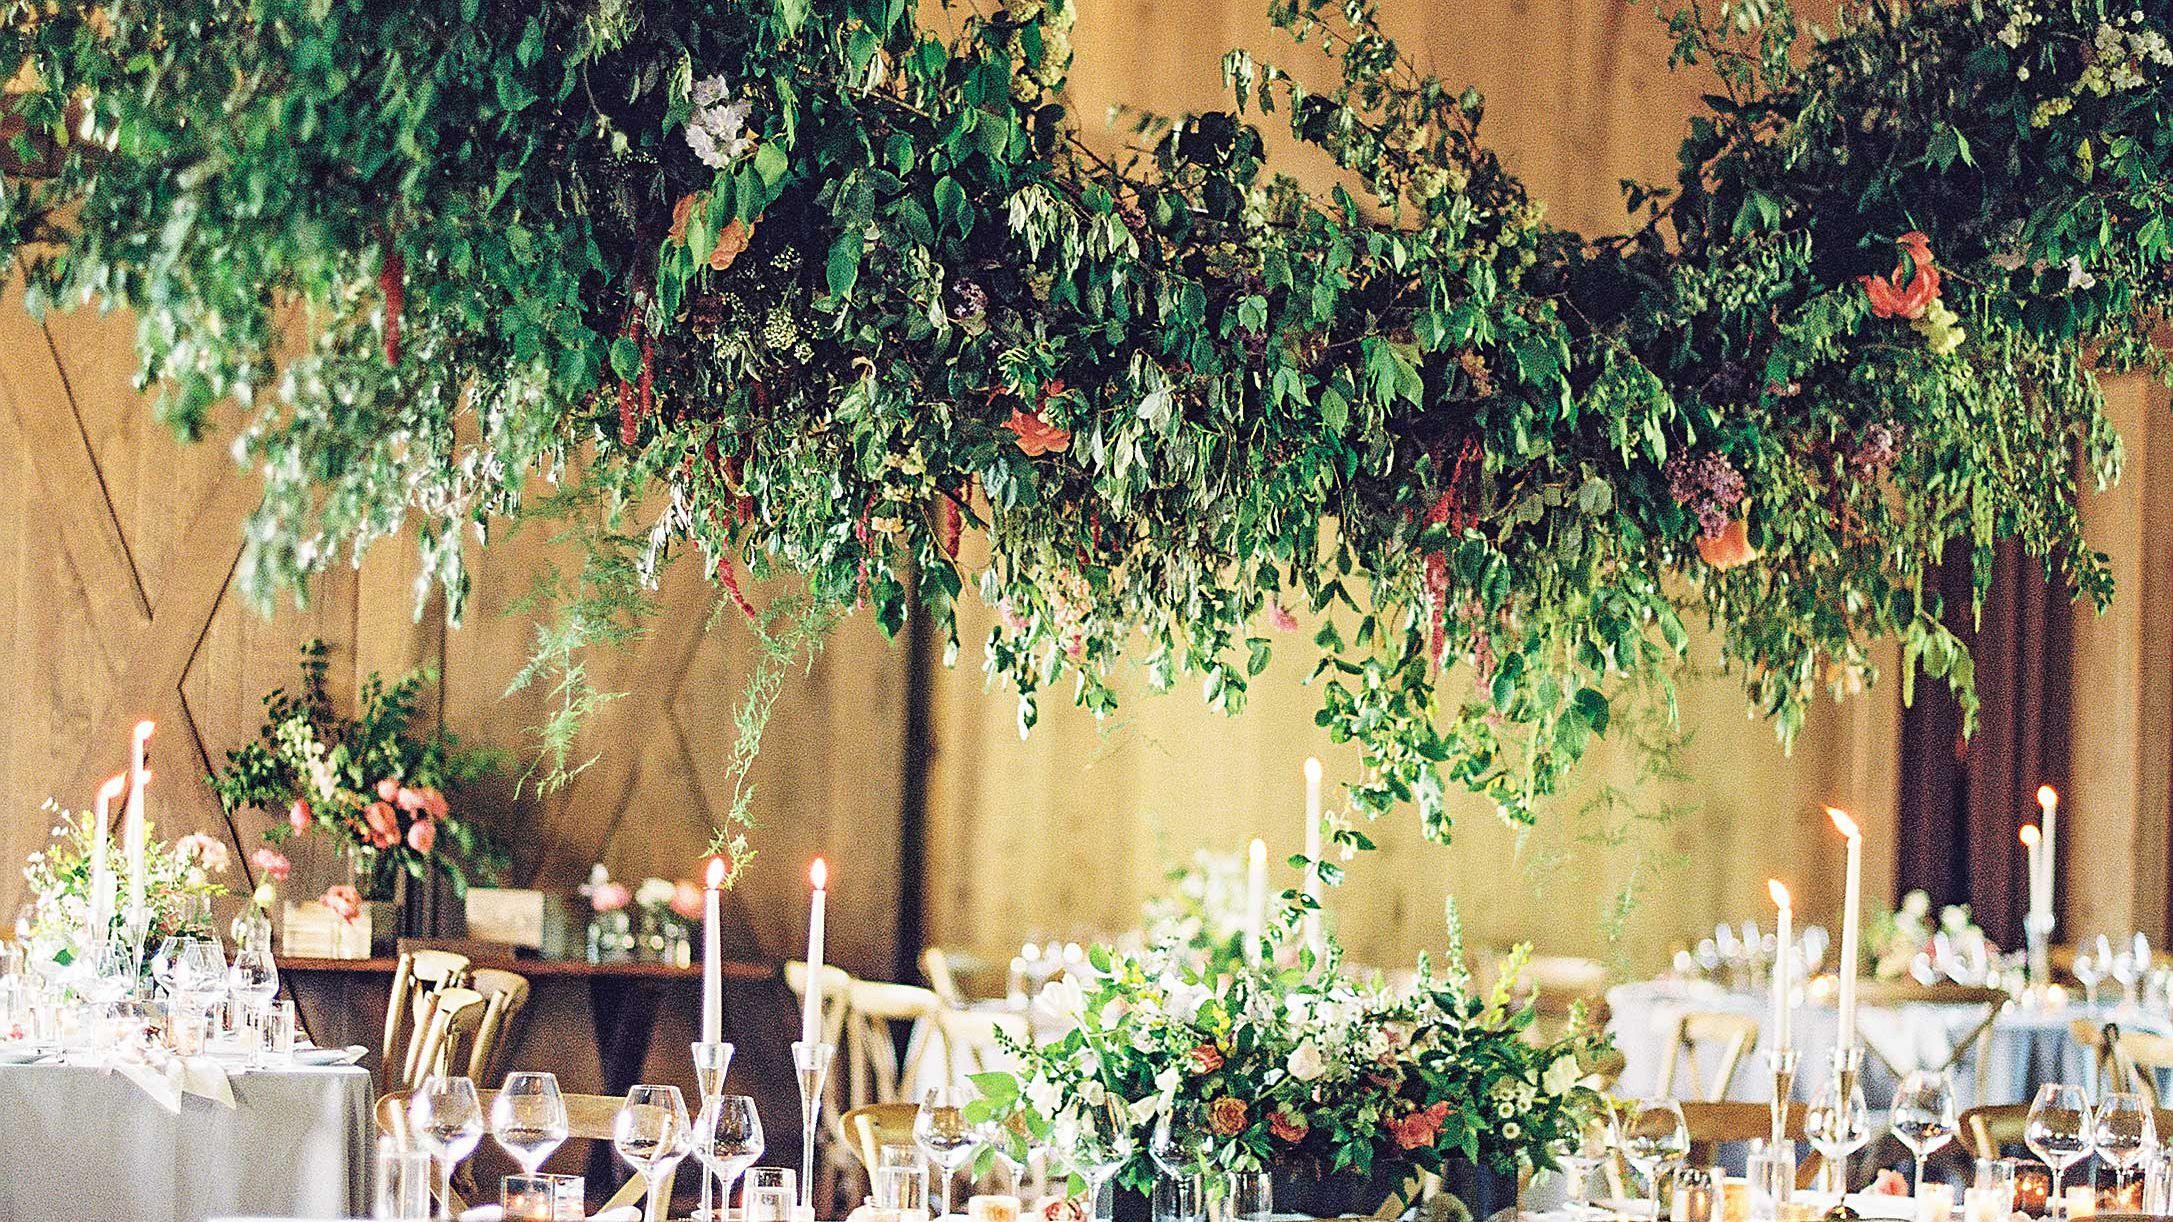 Miraculous 17 Fresh Ideas For A Fall Wedding Tablescape Short Links Chair Design For Home Short Linksinfo